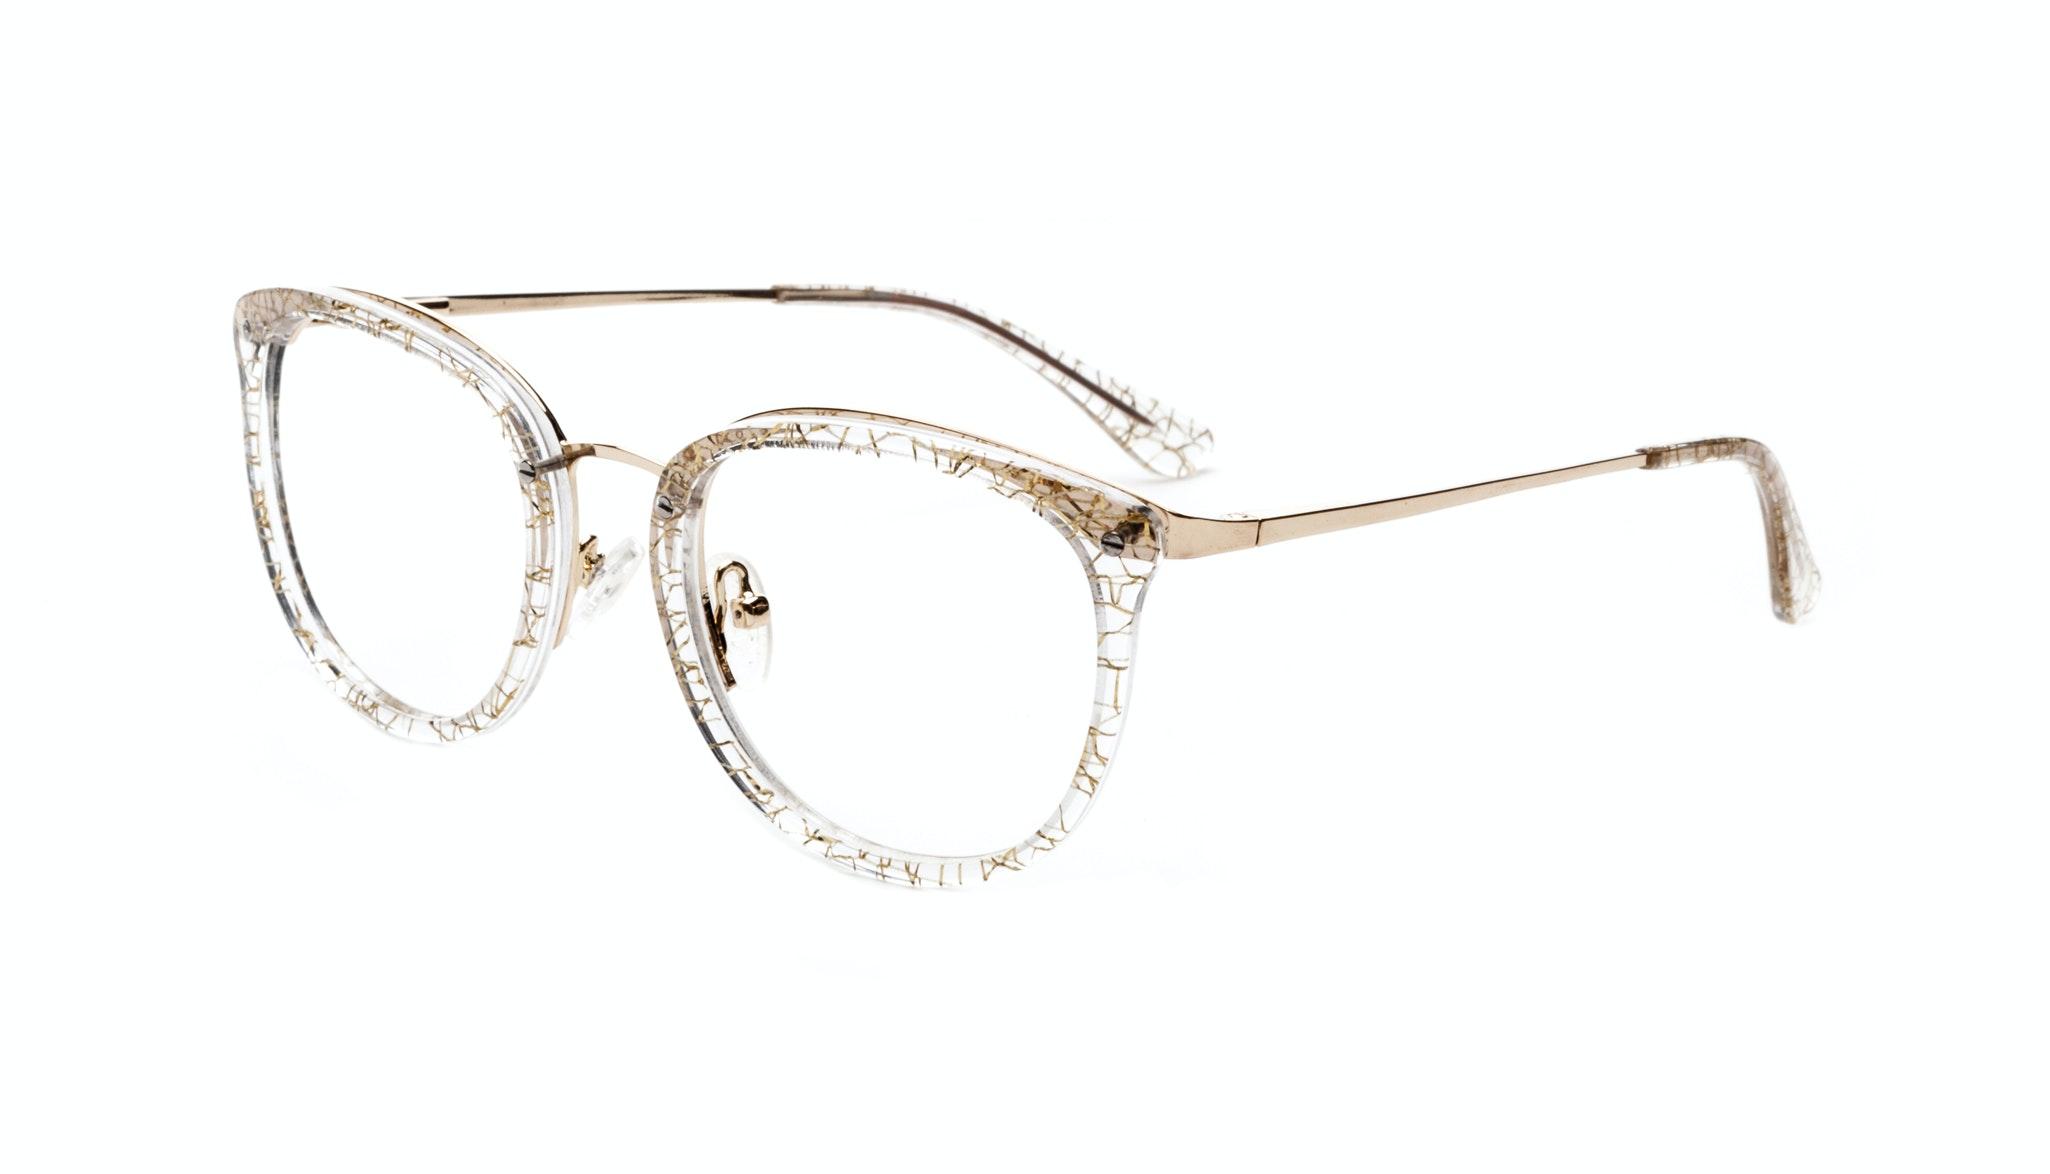 Affordable Fashion Glasses Round Eyeglasses Women Amaze Champagne Tilt